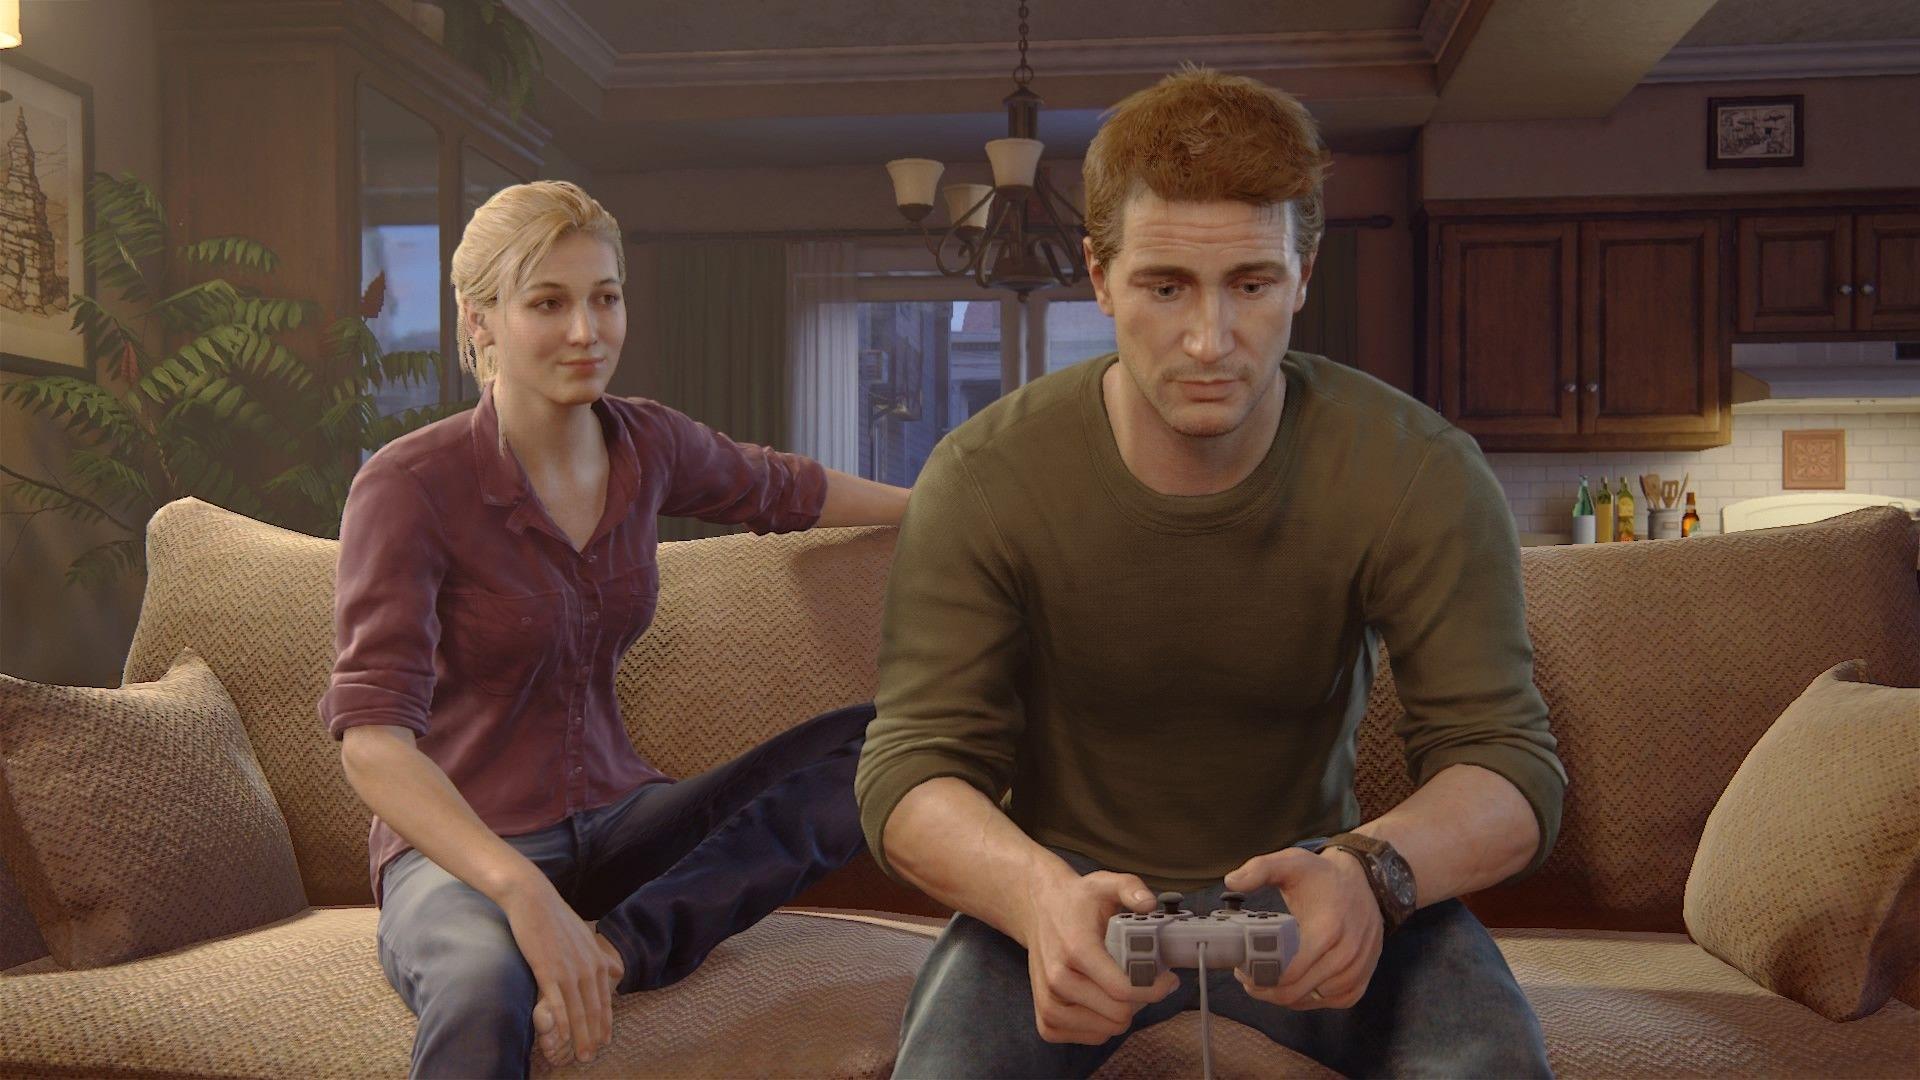 По слухам, идёт работа над Uncharted 5 — Sony ищет разработчиков